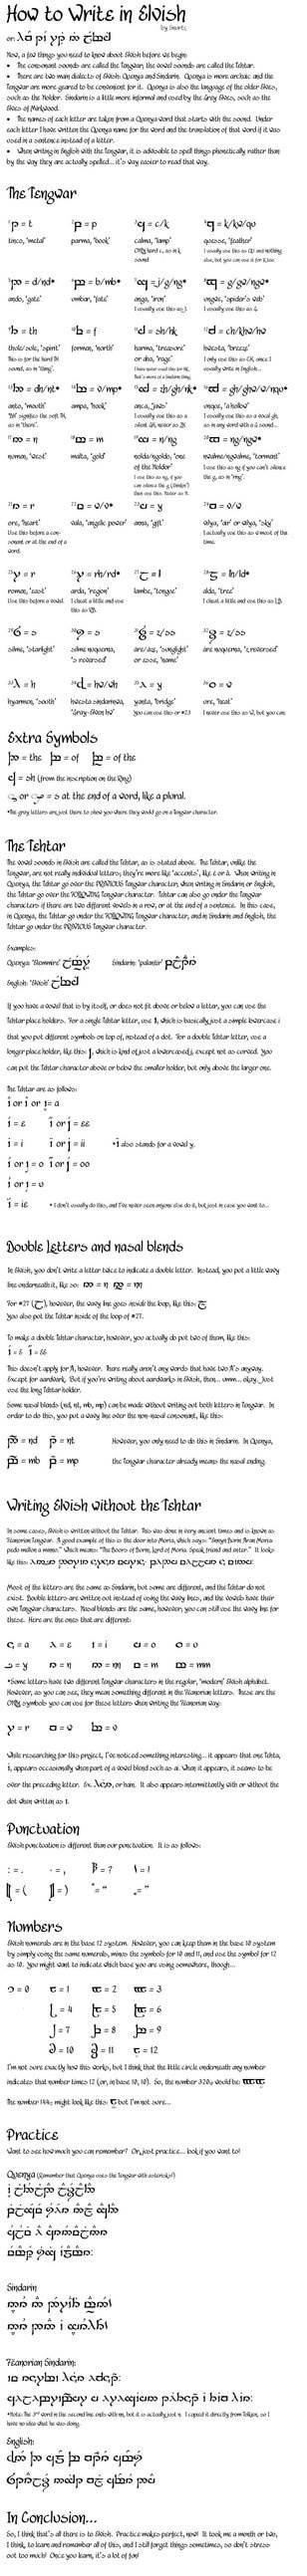 how to write in elvish